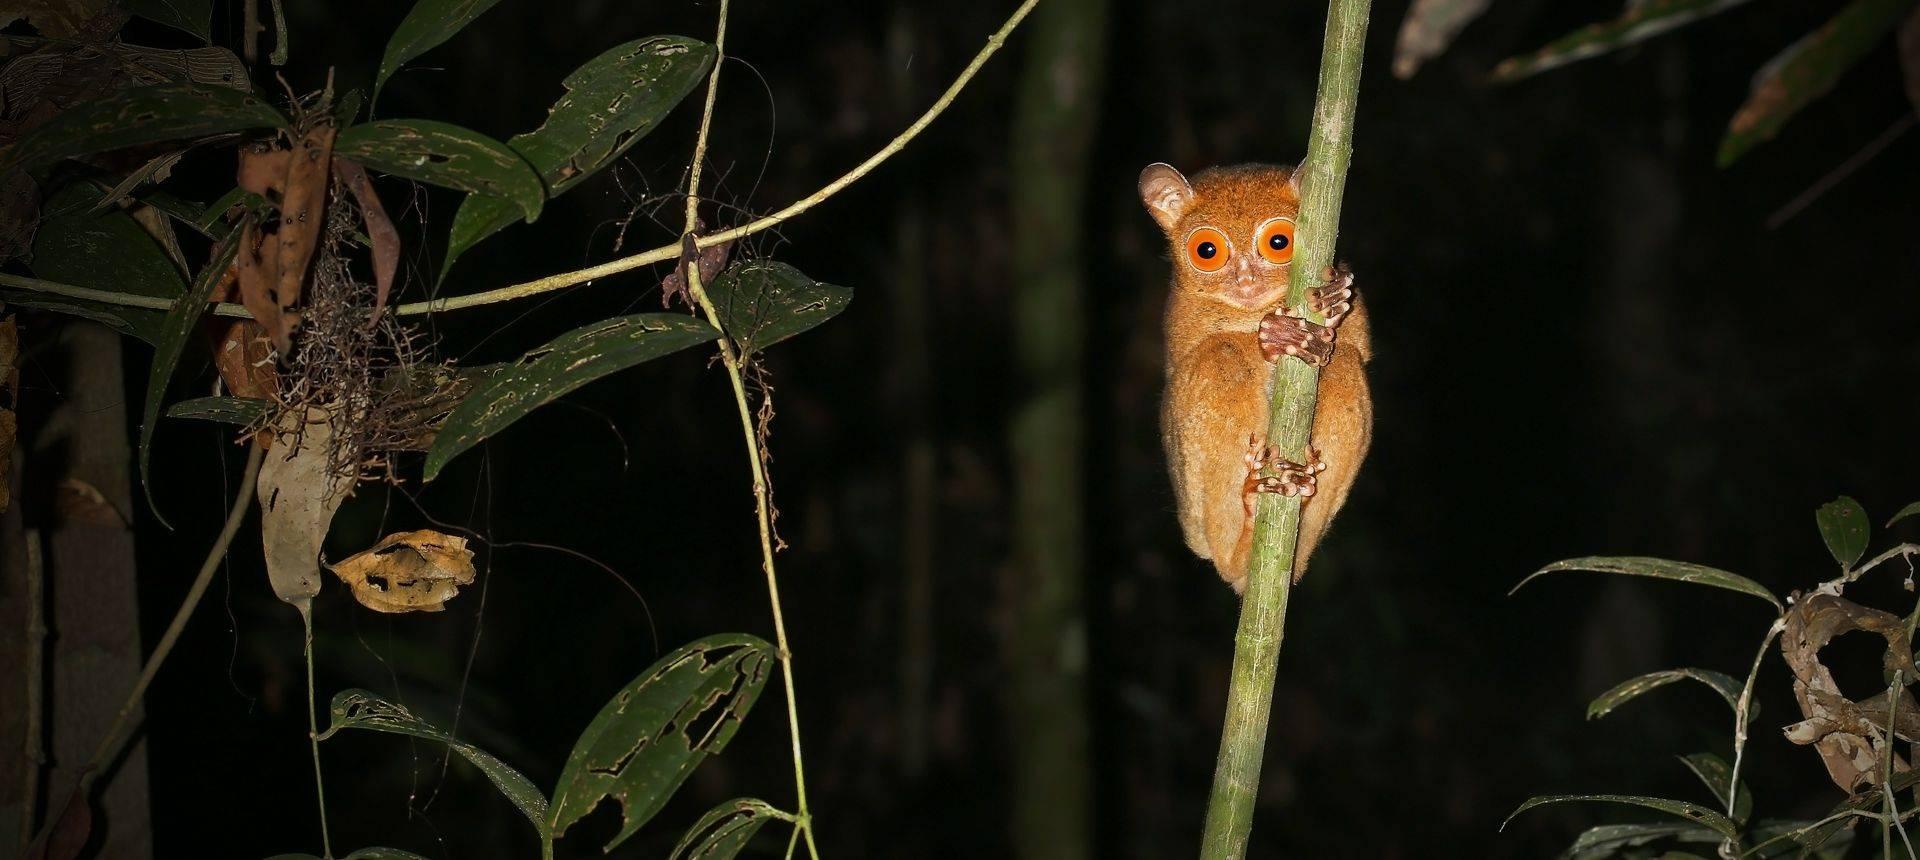 Western Or Horsfield'S Tarsier Borneo Shutterstock 165350882